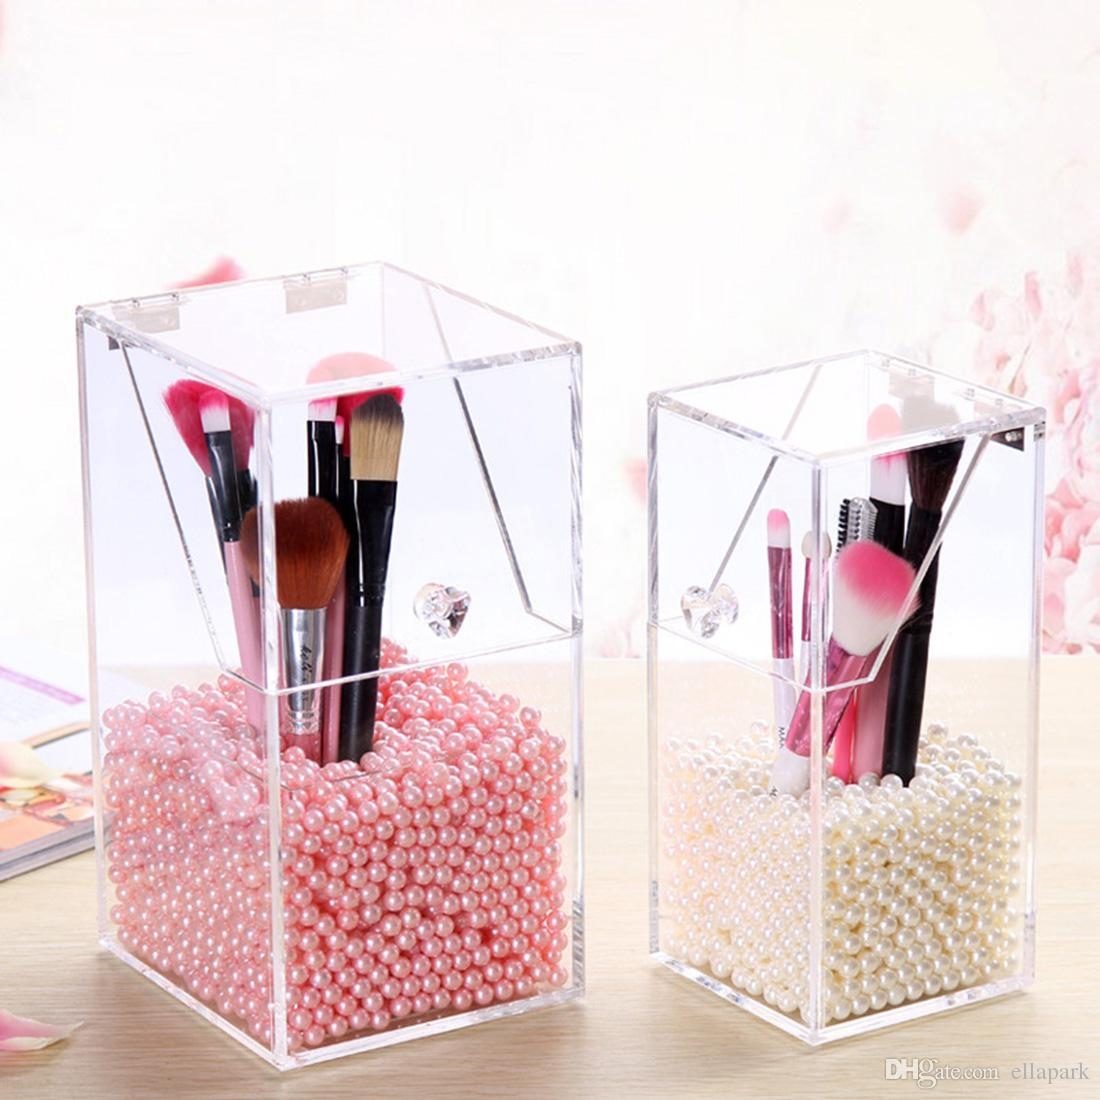 Crystal Plastic Makeup Brush Organizer Cosmetic Storage Box Makeup Tool  Flashing Pencil Holder Lipstick Organizer Case Storage Box Brushes Storage  Box ...